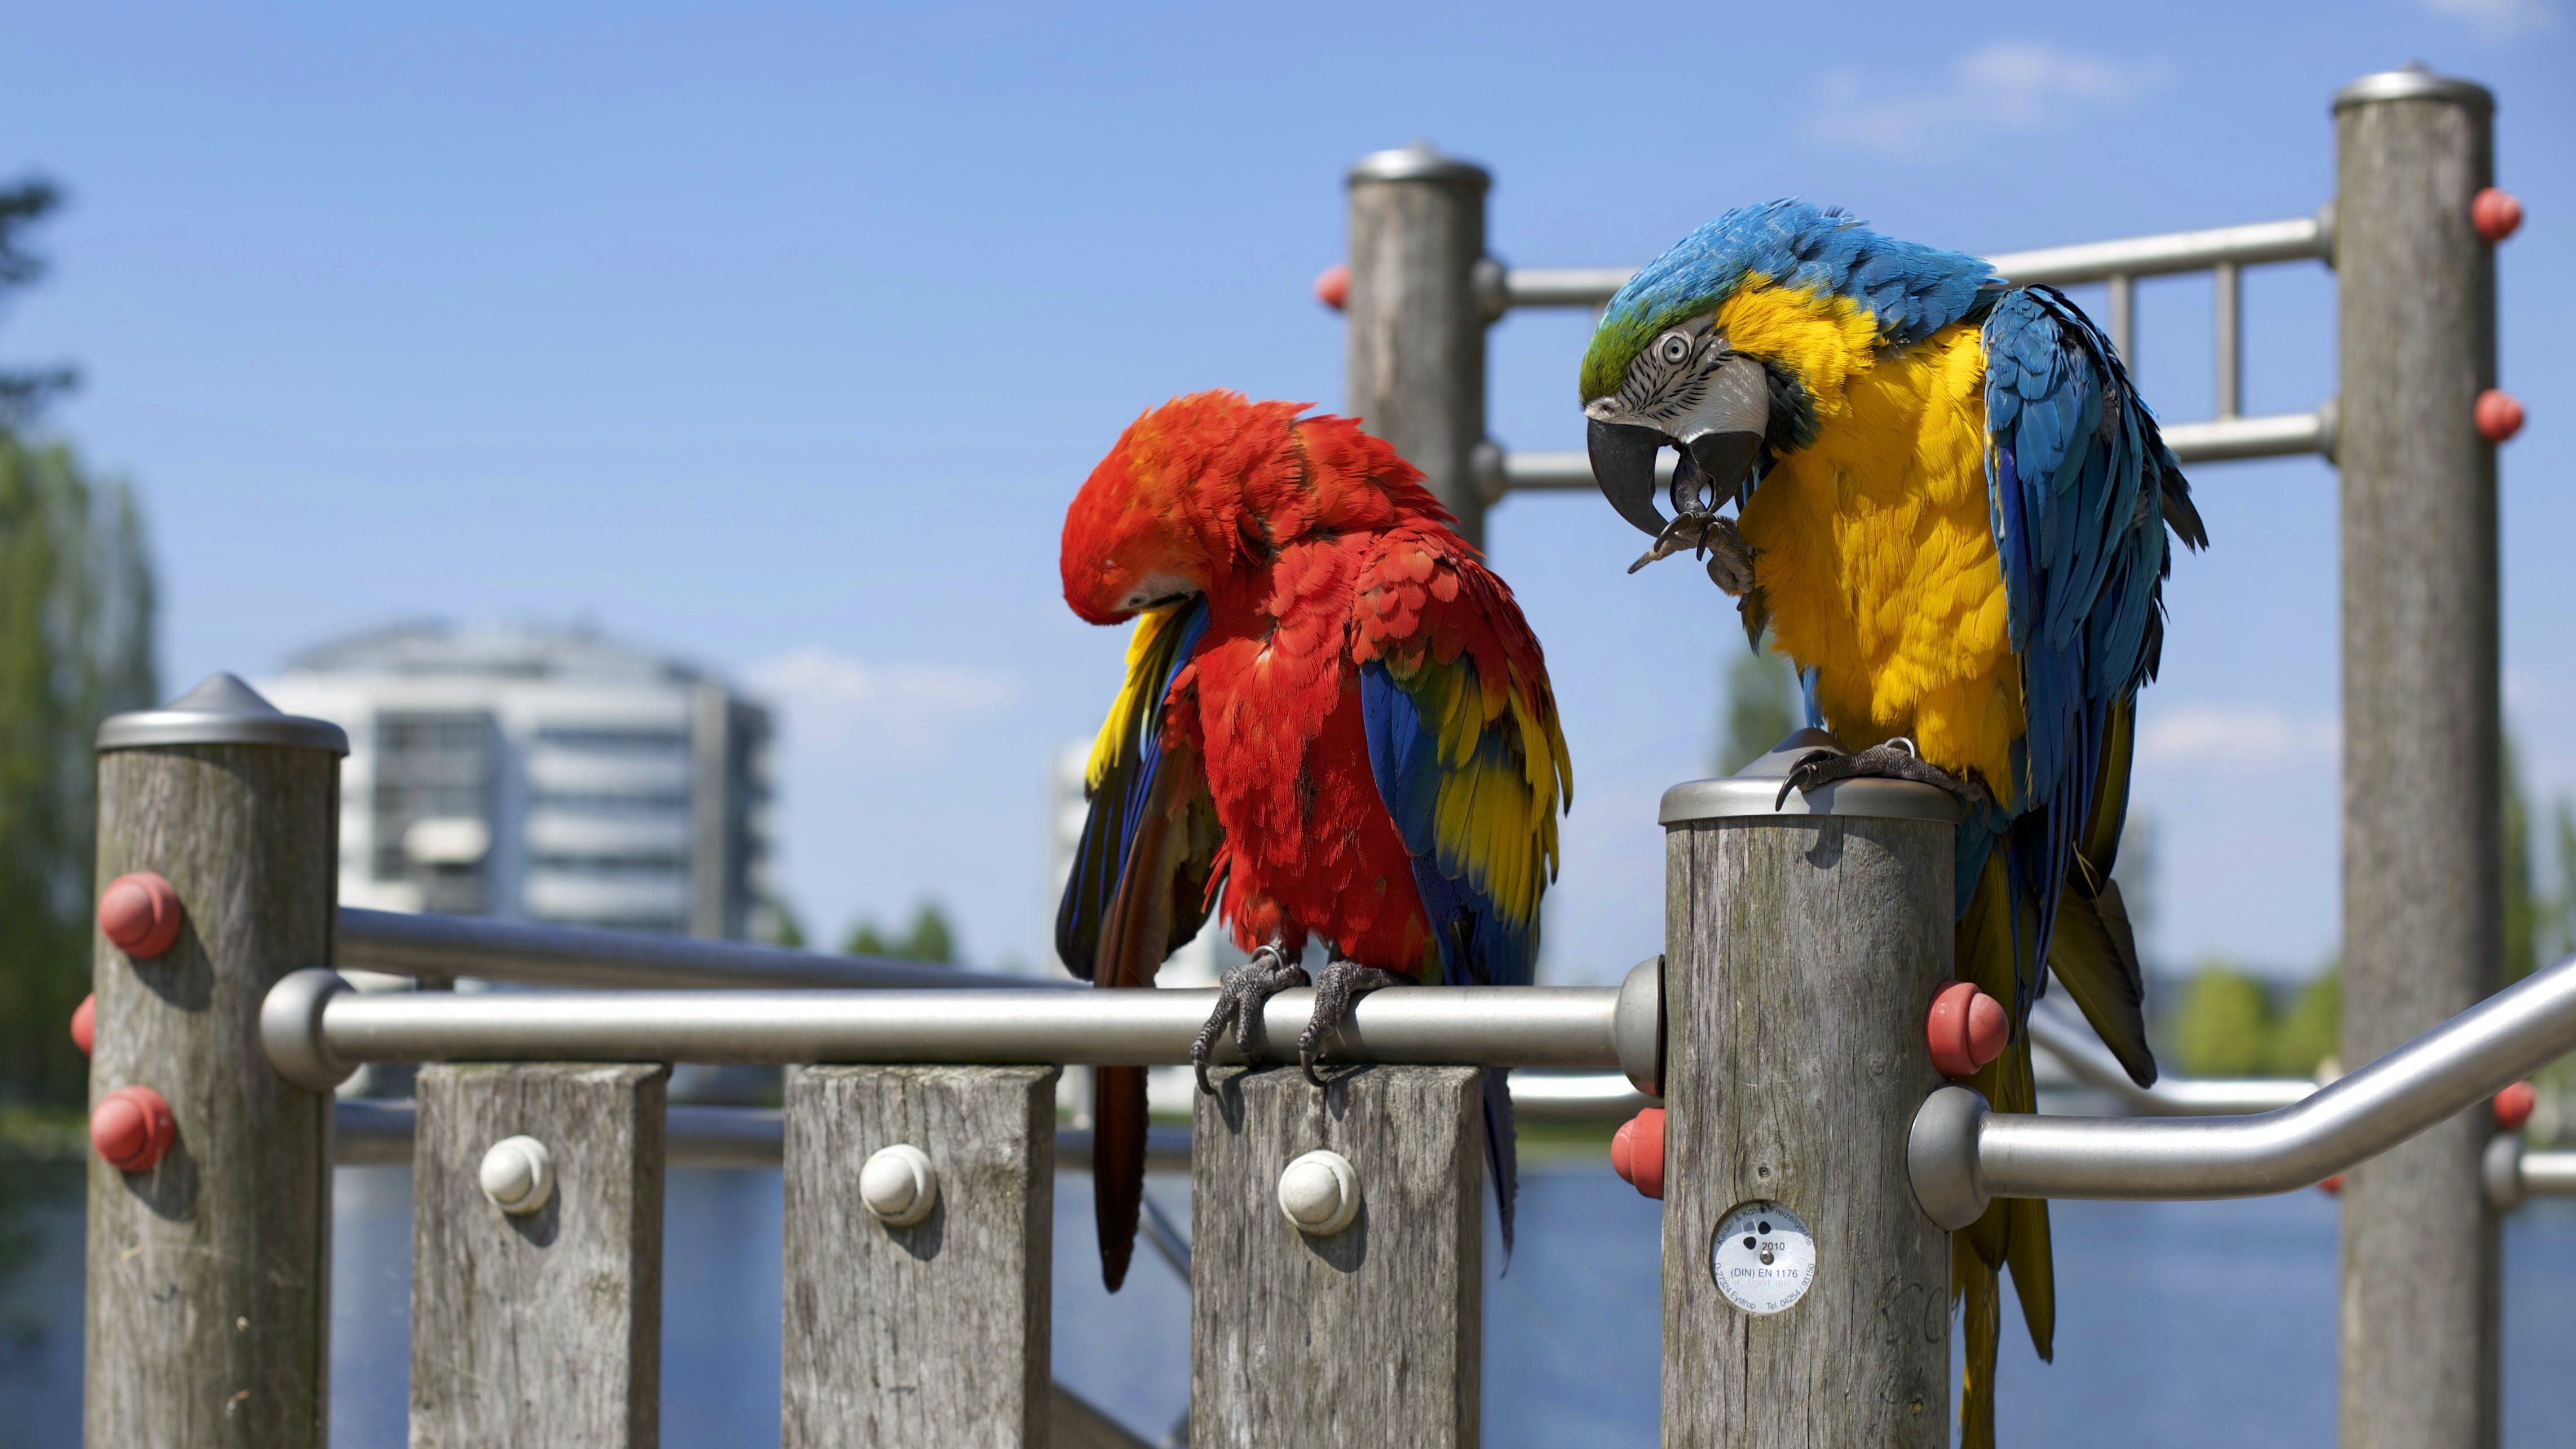 animals, avian, birds